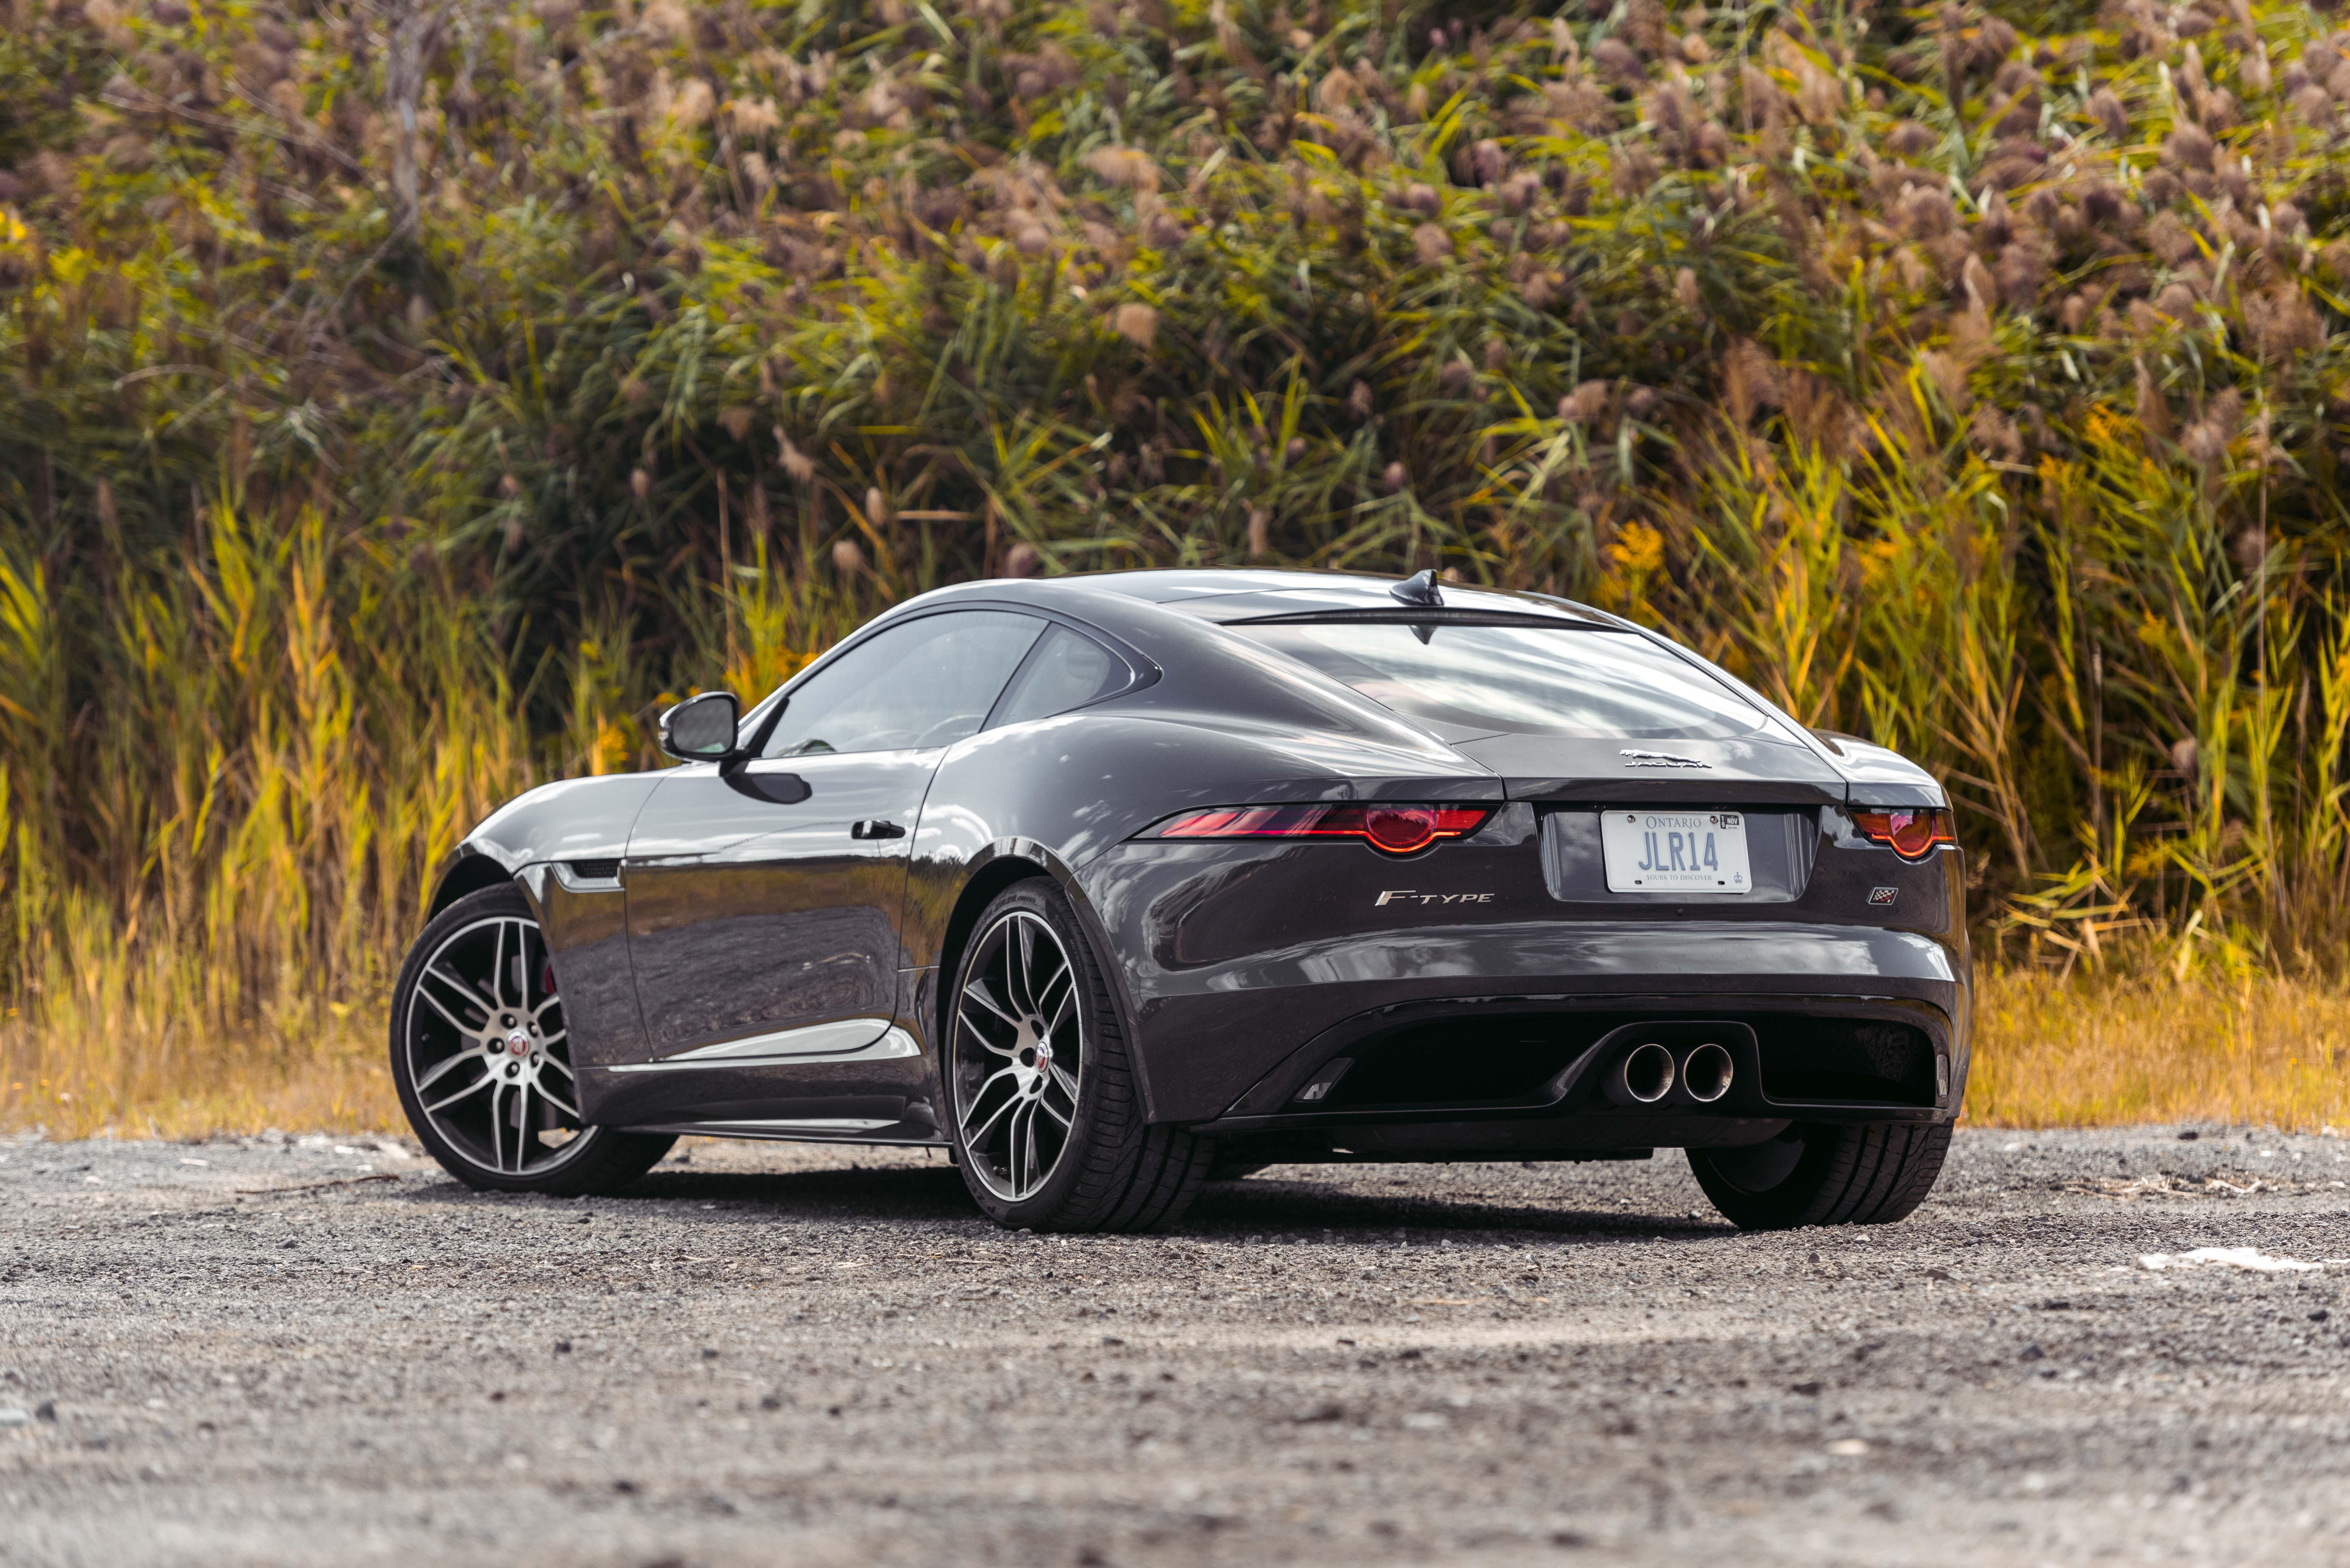 2020 Jaguar F-Type Is A Celebration Of Automotive Design